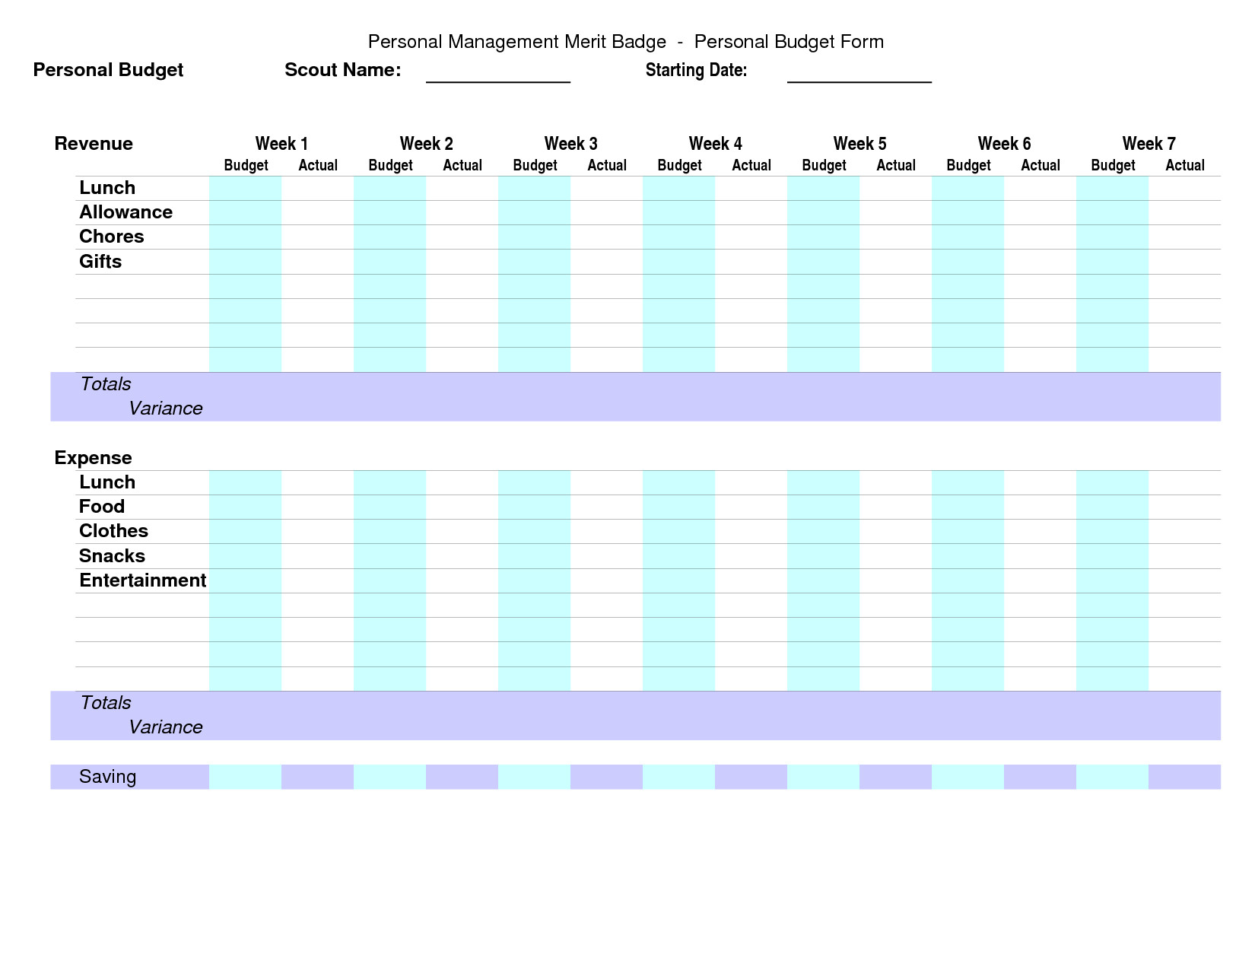 Personal Management Merit Badge Excel Spreadsheet Within Personal Management Merit Badge Excel Spreadsheet  My Spreadsheet